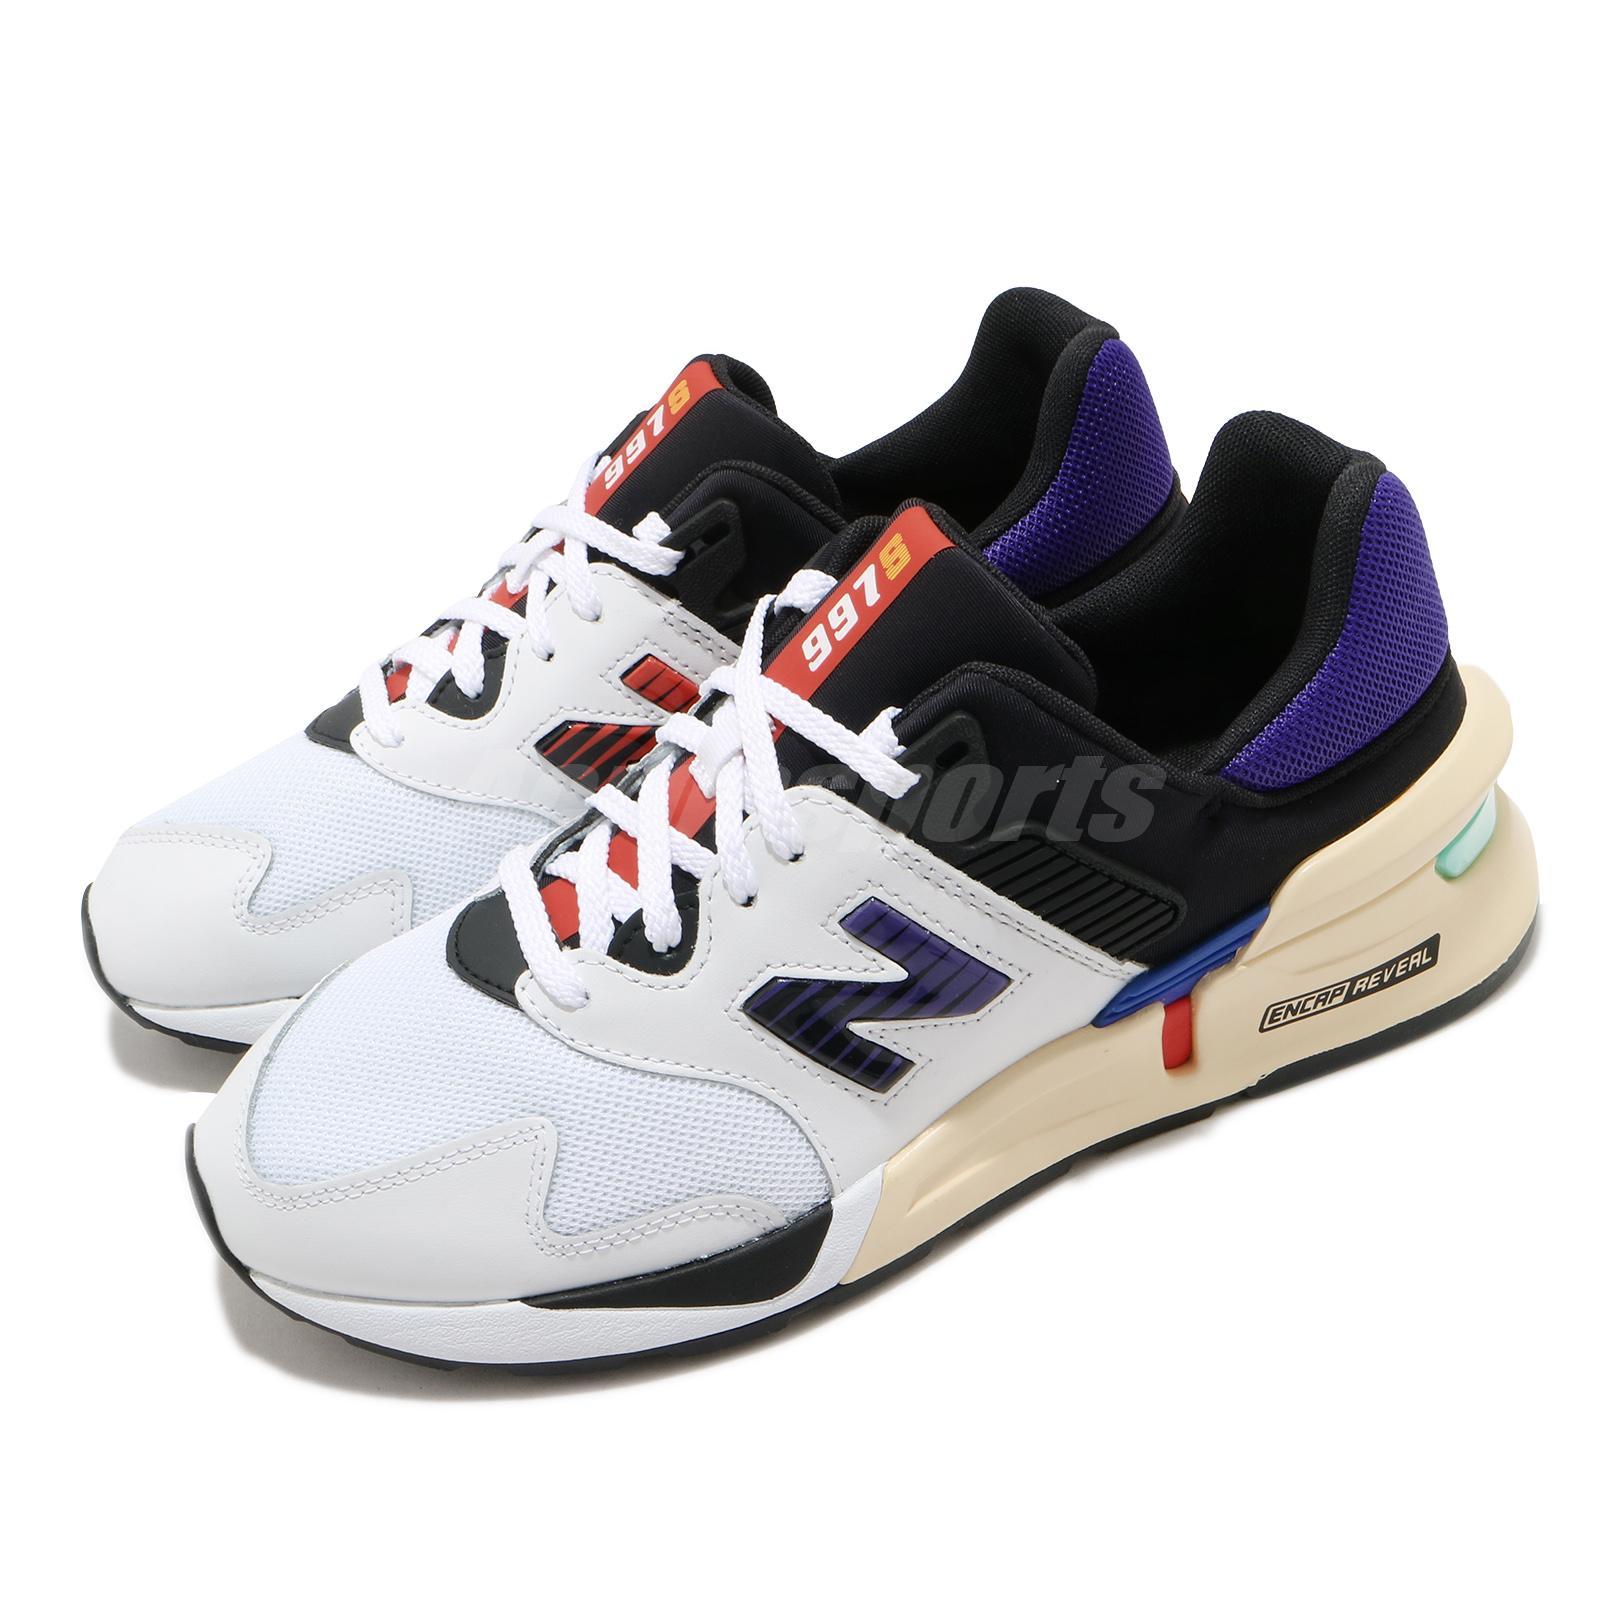 New Balance 997 997S Sport White Black